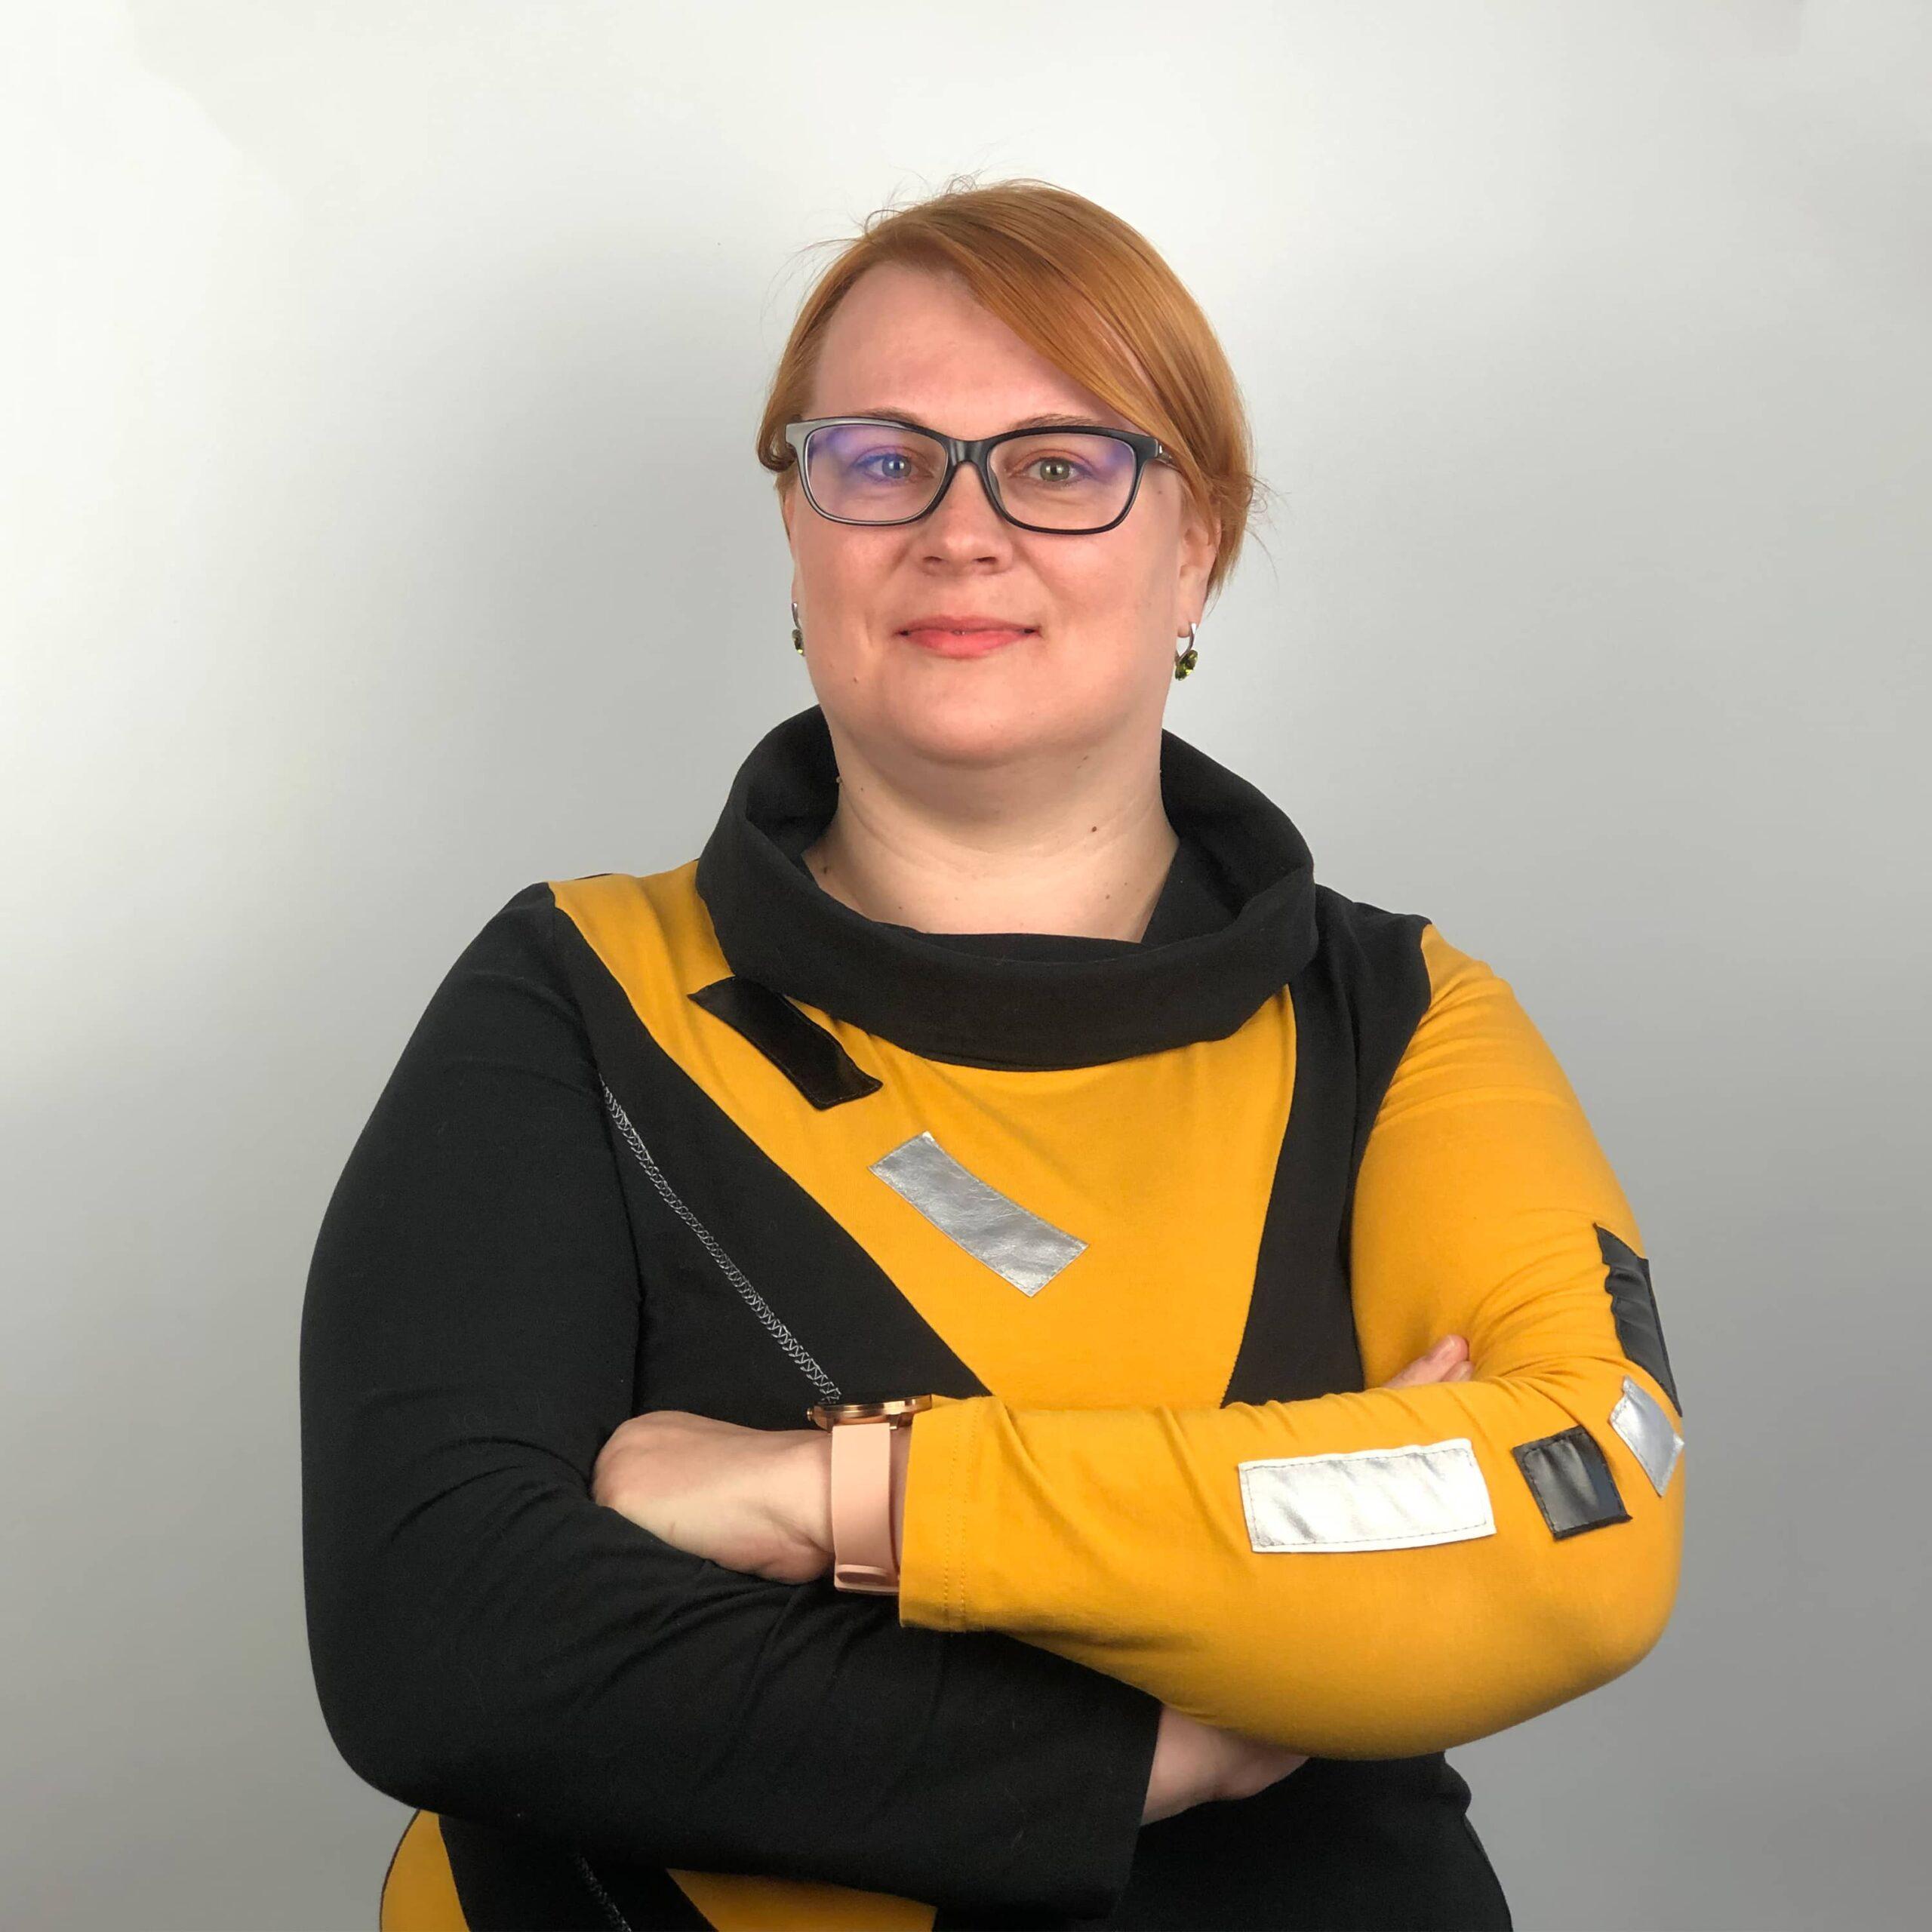 Tamara Drevenšek